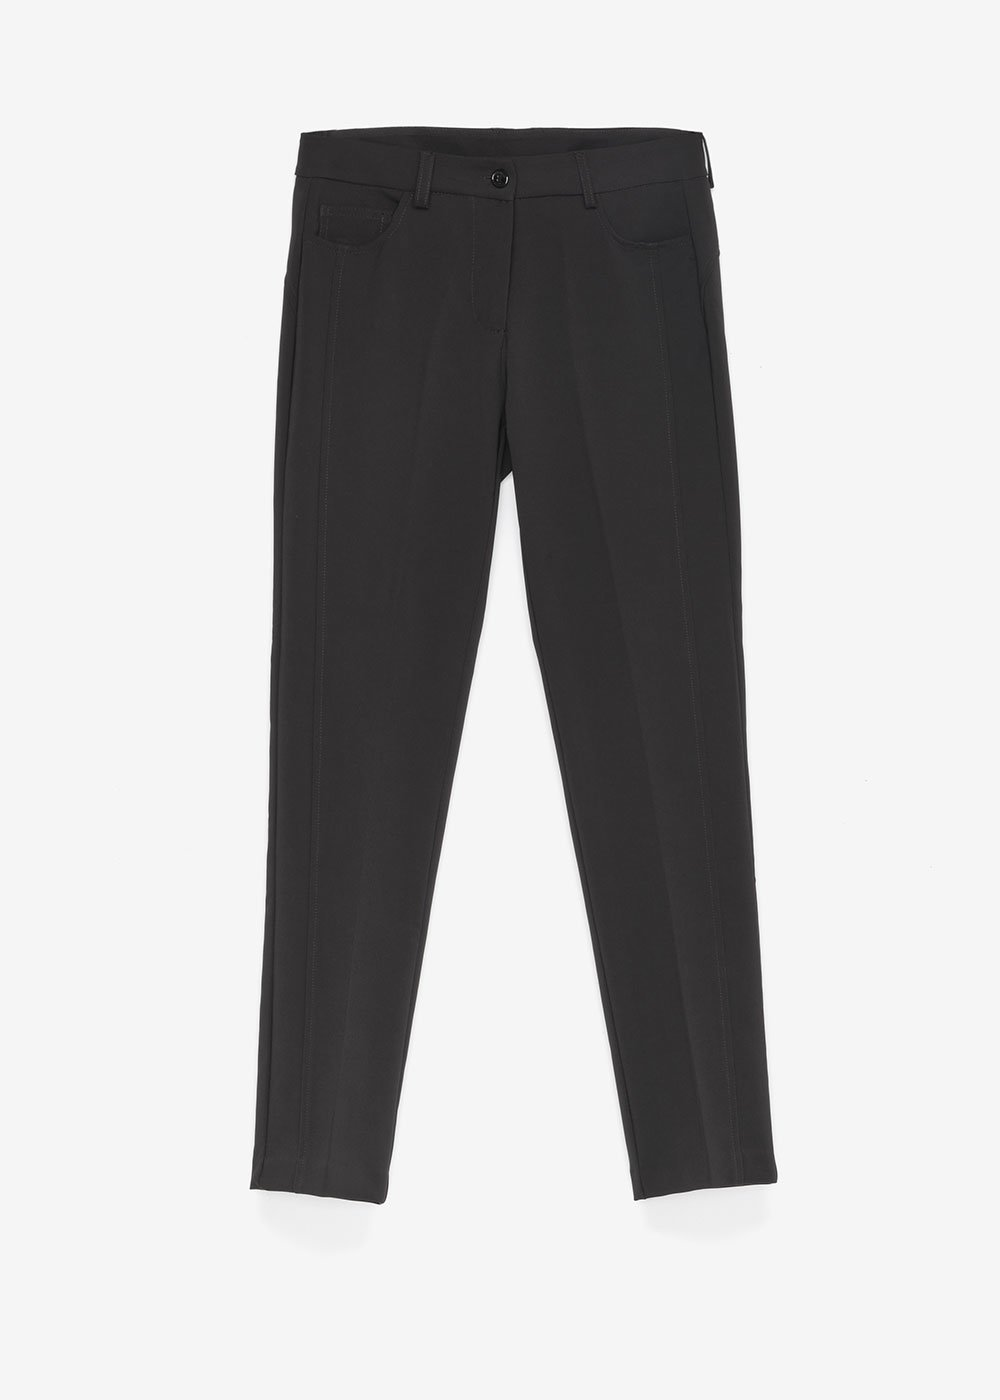 Katerunne skinny trousers - Black - Woman